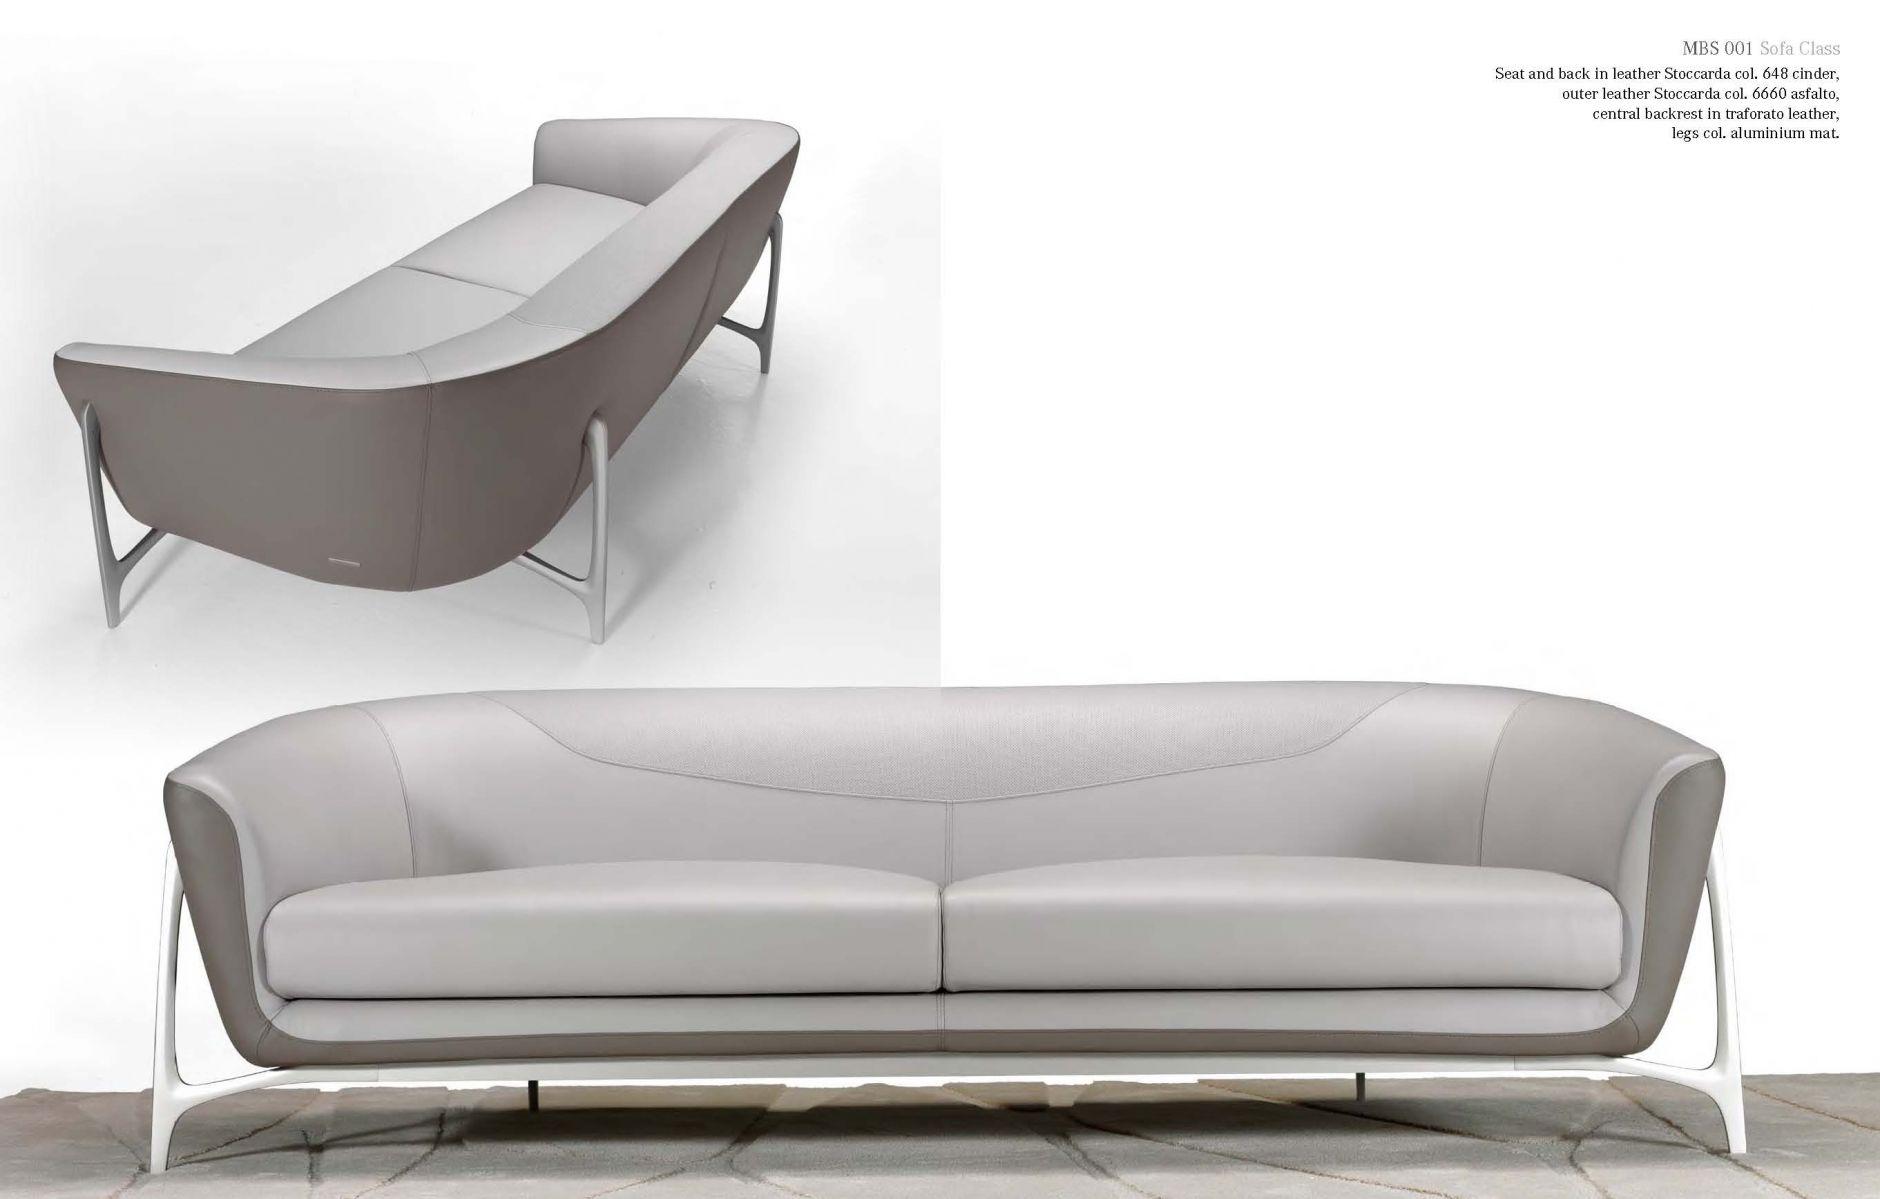 Upholstered Sofa Vip Luxury Upholstered Furniture